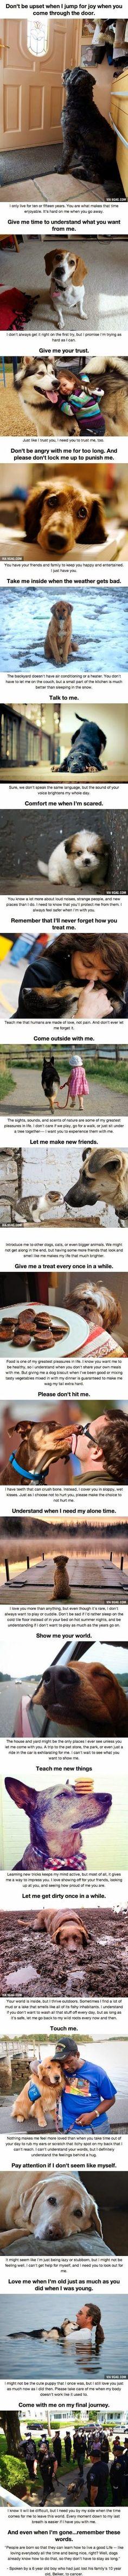 We Ahead: dog, a mans best friend